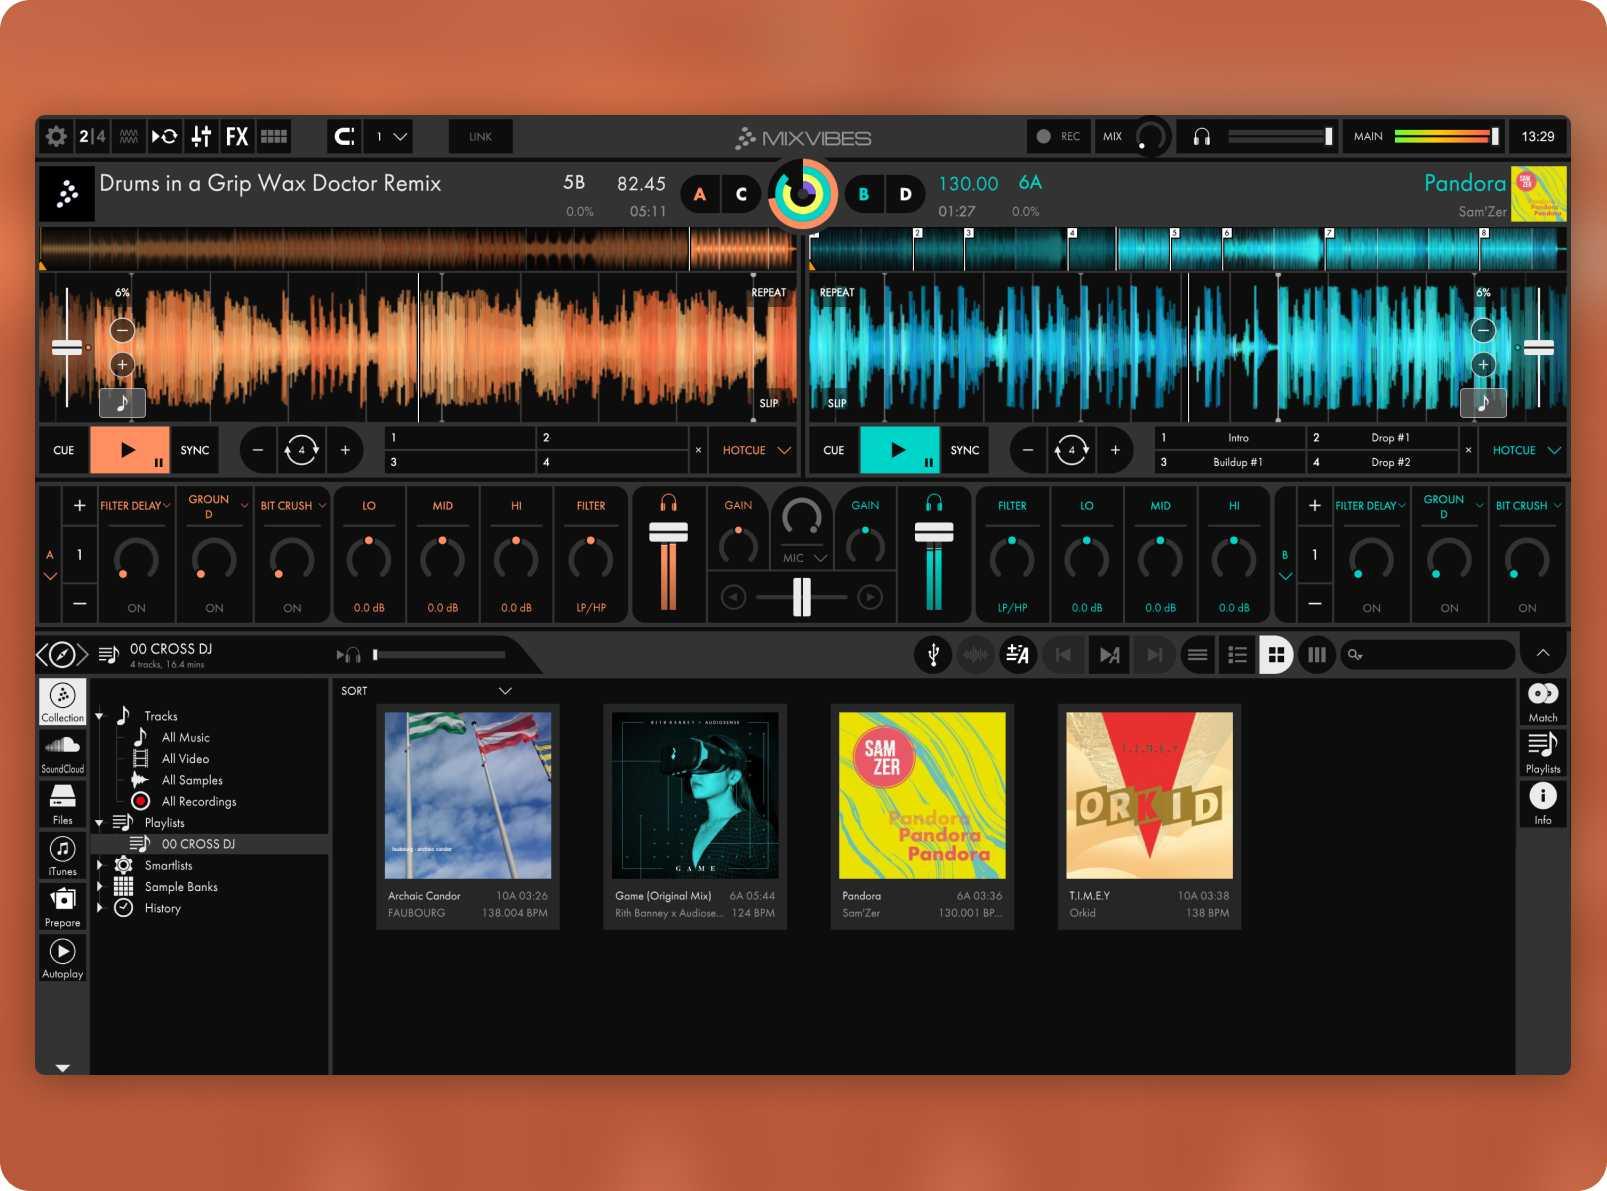 Cross DJ's 2 decks view